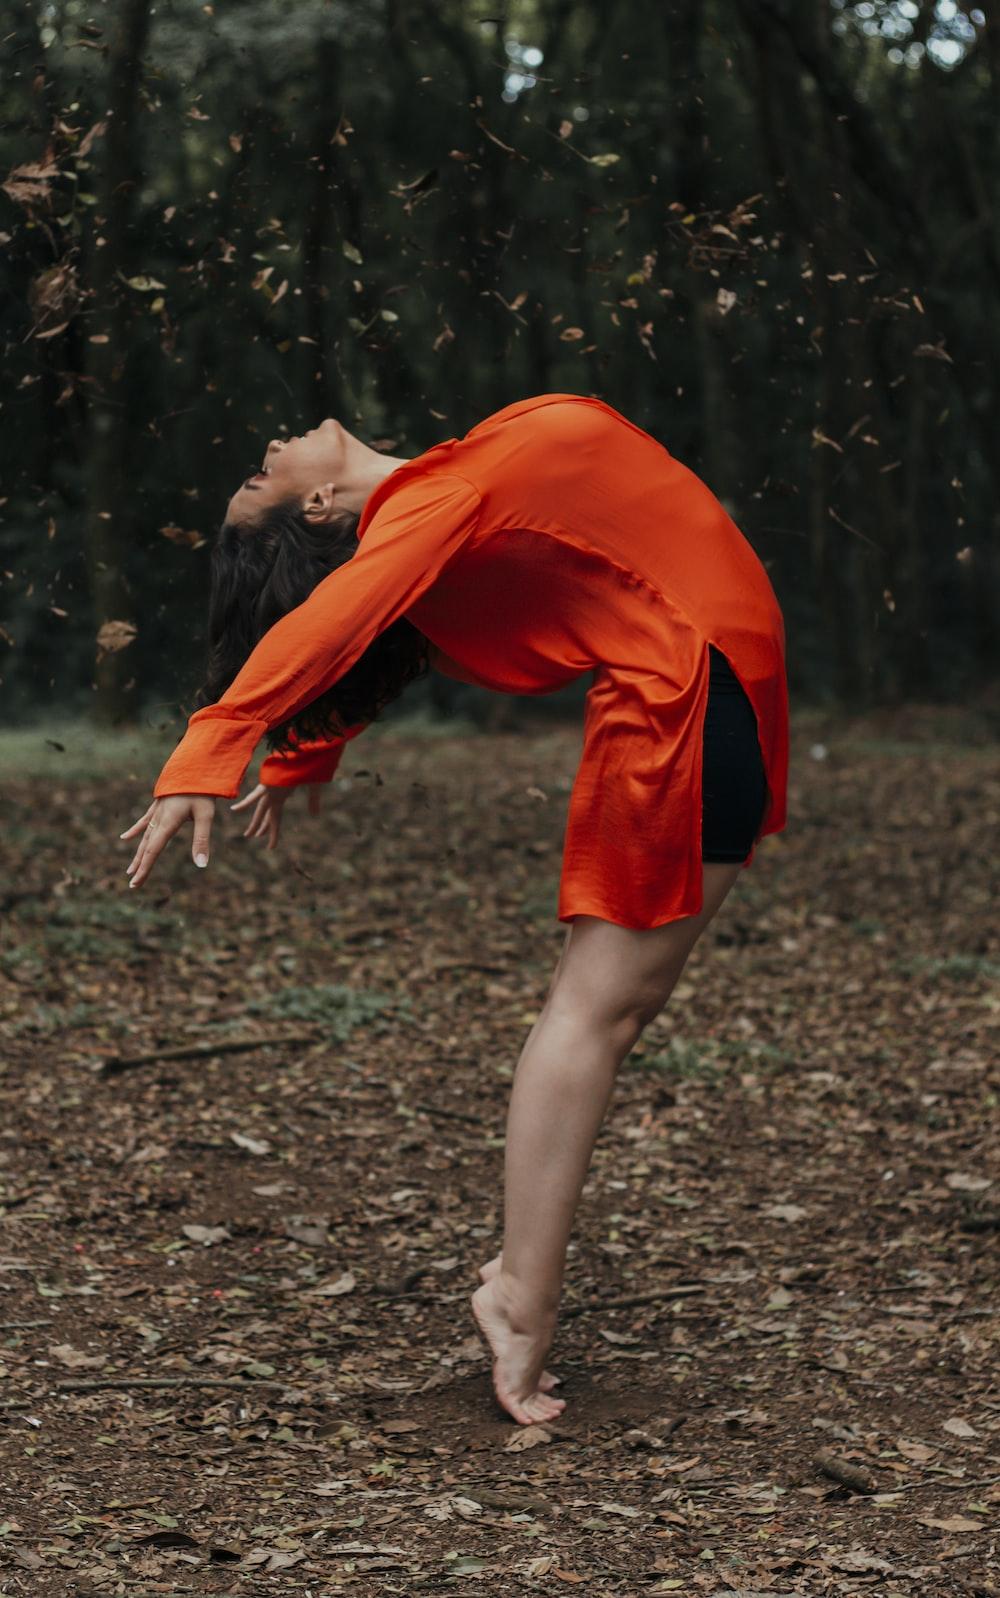 woman in orange dress standing on ground